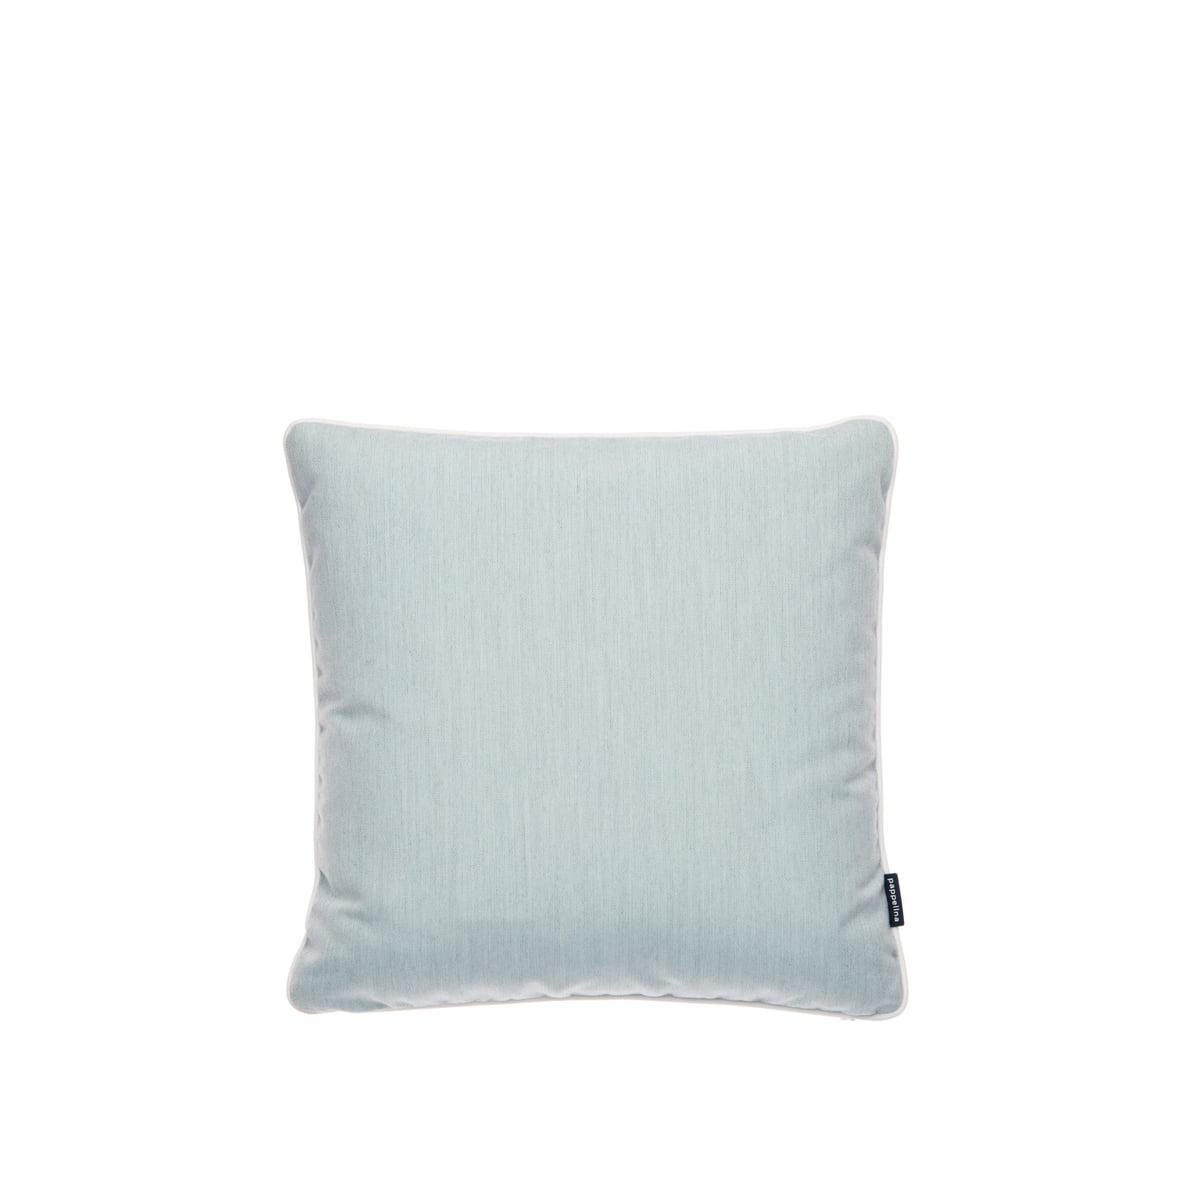 Pappelina - Sunny Outdoorkissen, 44 x 44 cm, pale turquoise | Garten > Gartenmöbel > Outdoor-Sitzsäcke | Pastelltürkis | Pappelina